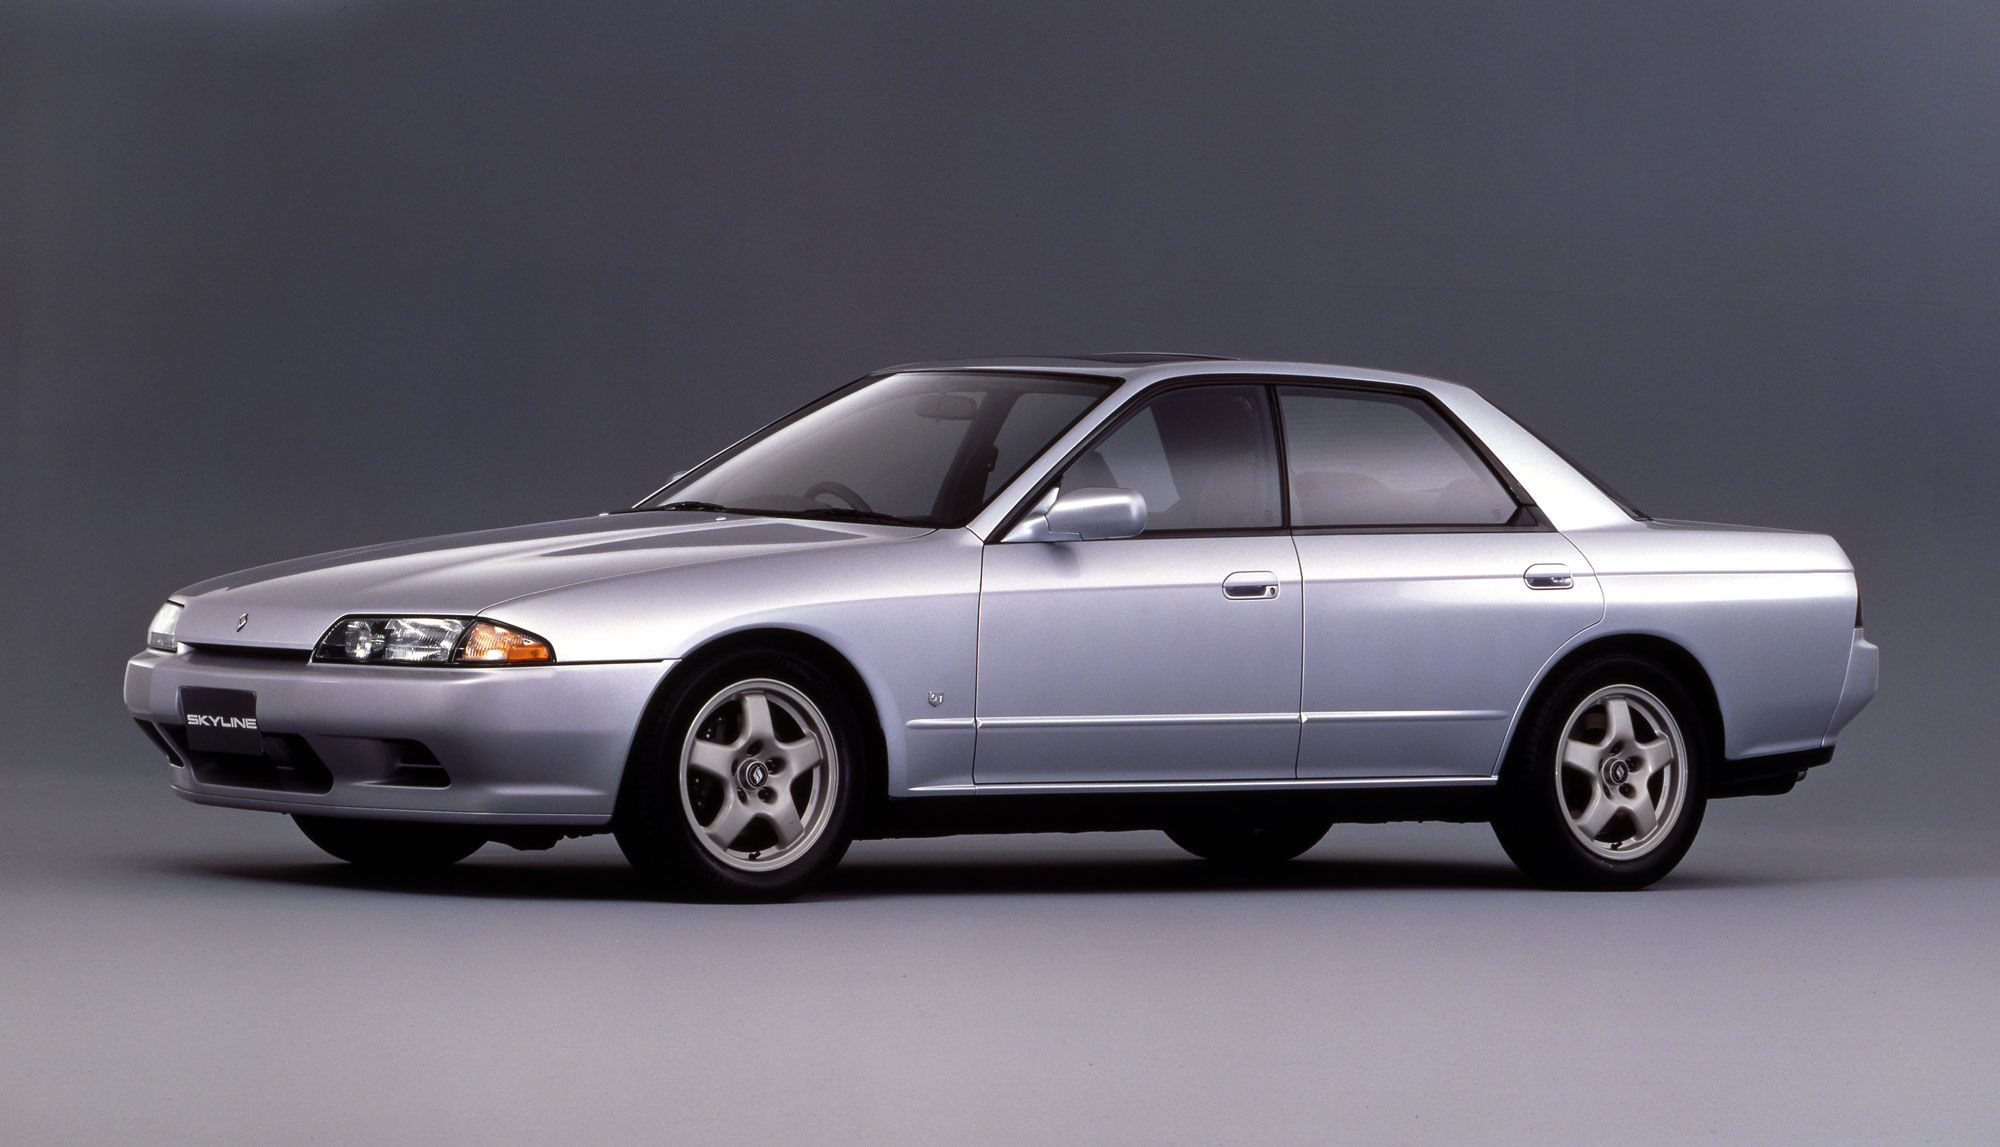 1989 nissan skyline gts t type m rcr32 autos pinterest 1989 nissan skyline gts t type m rcr32 vanachro Images